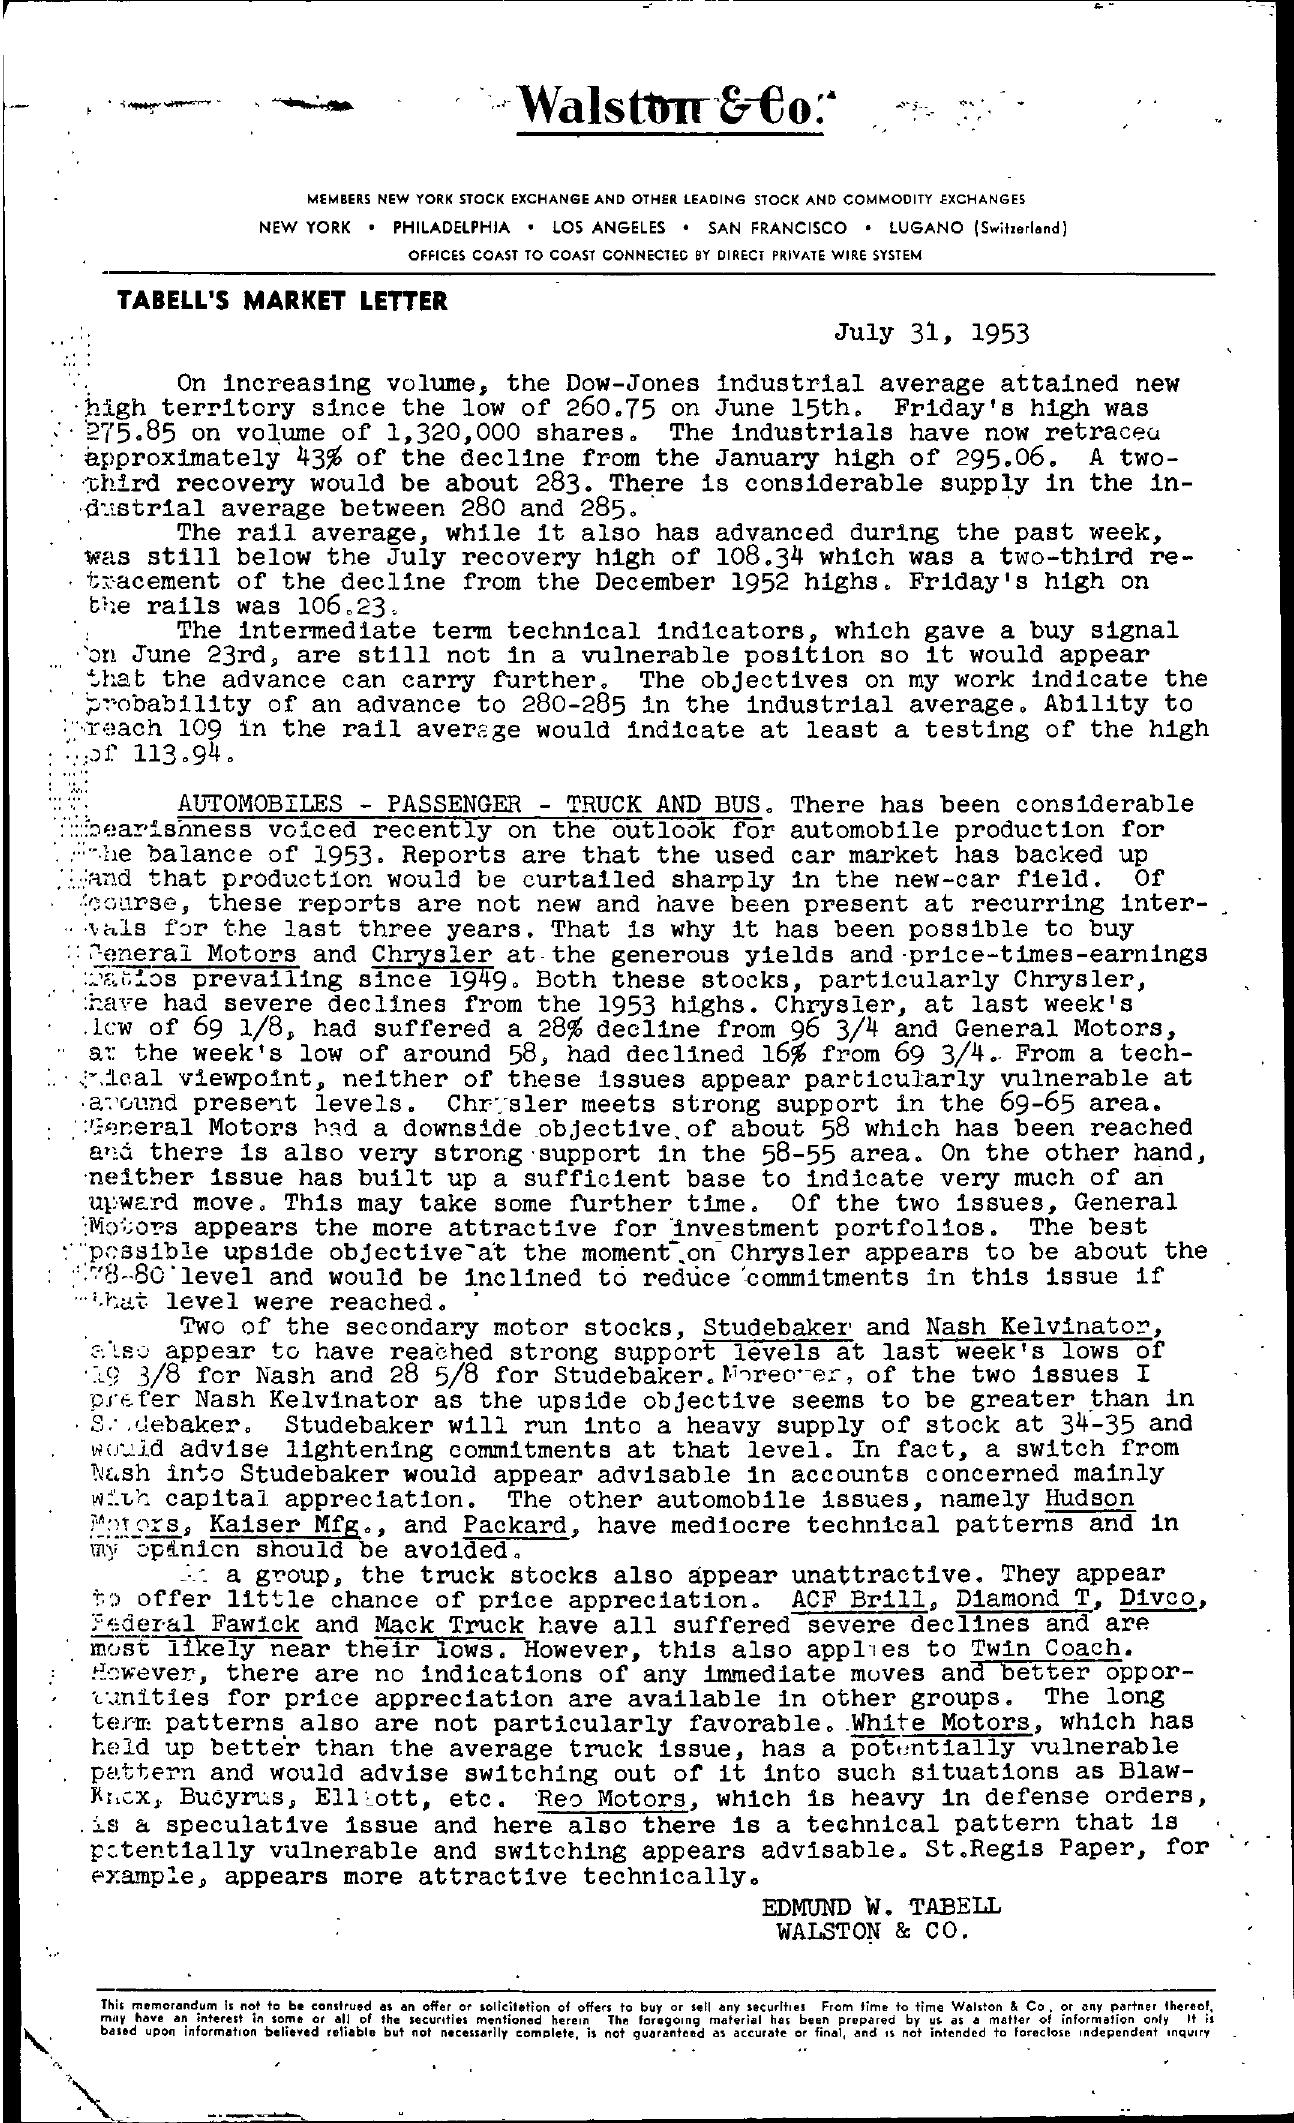 Tabell's Market Letter - July 31, 1953